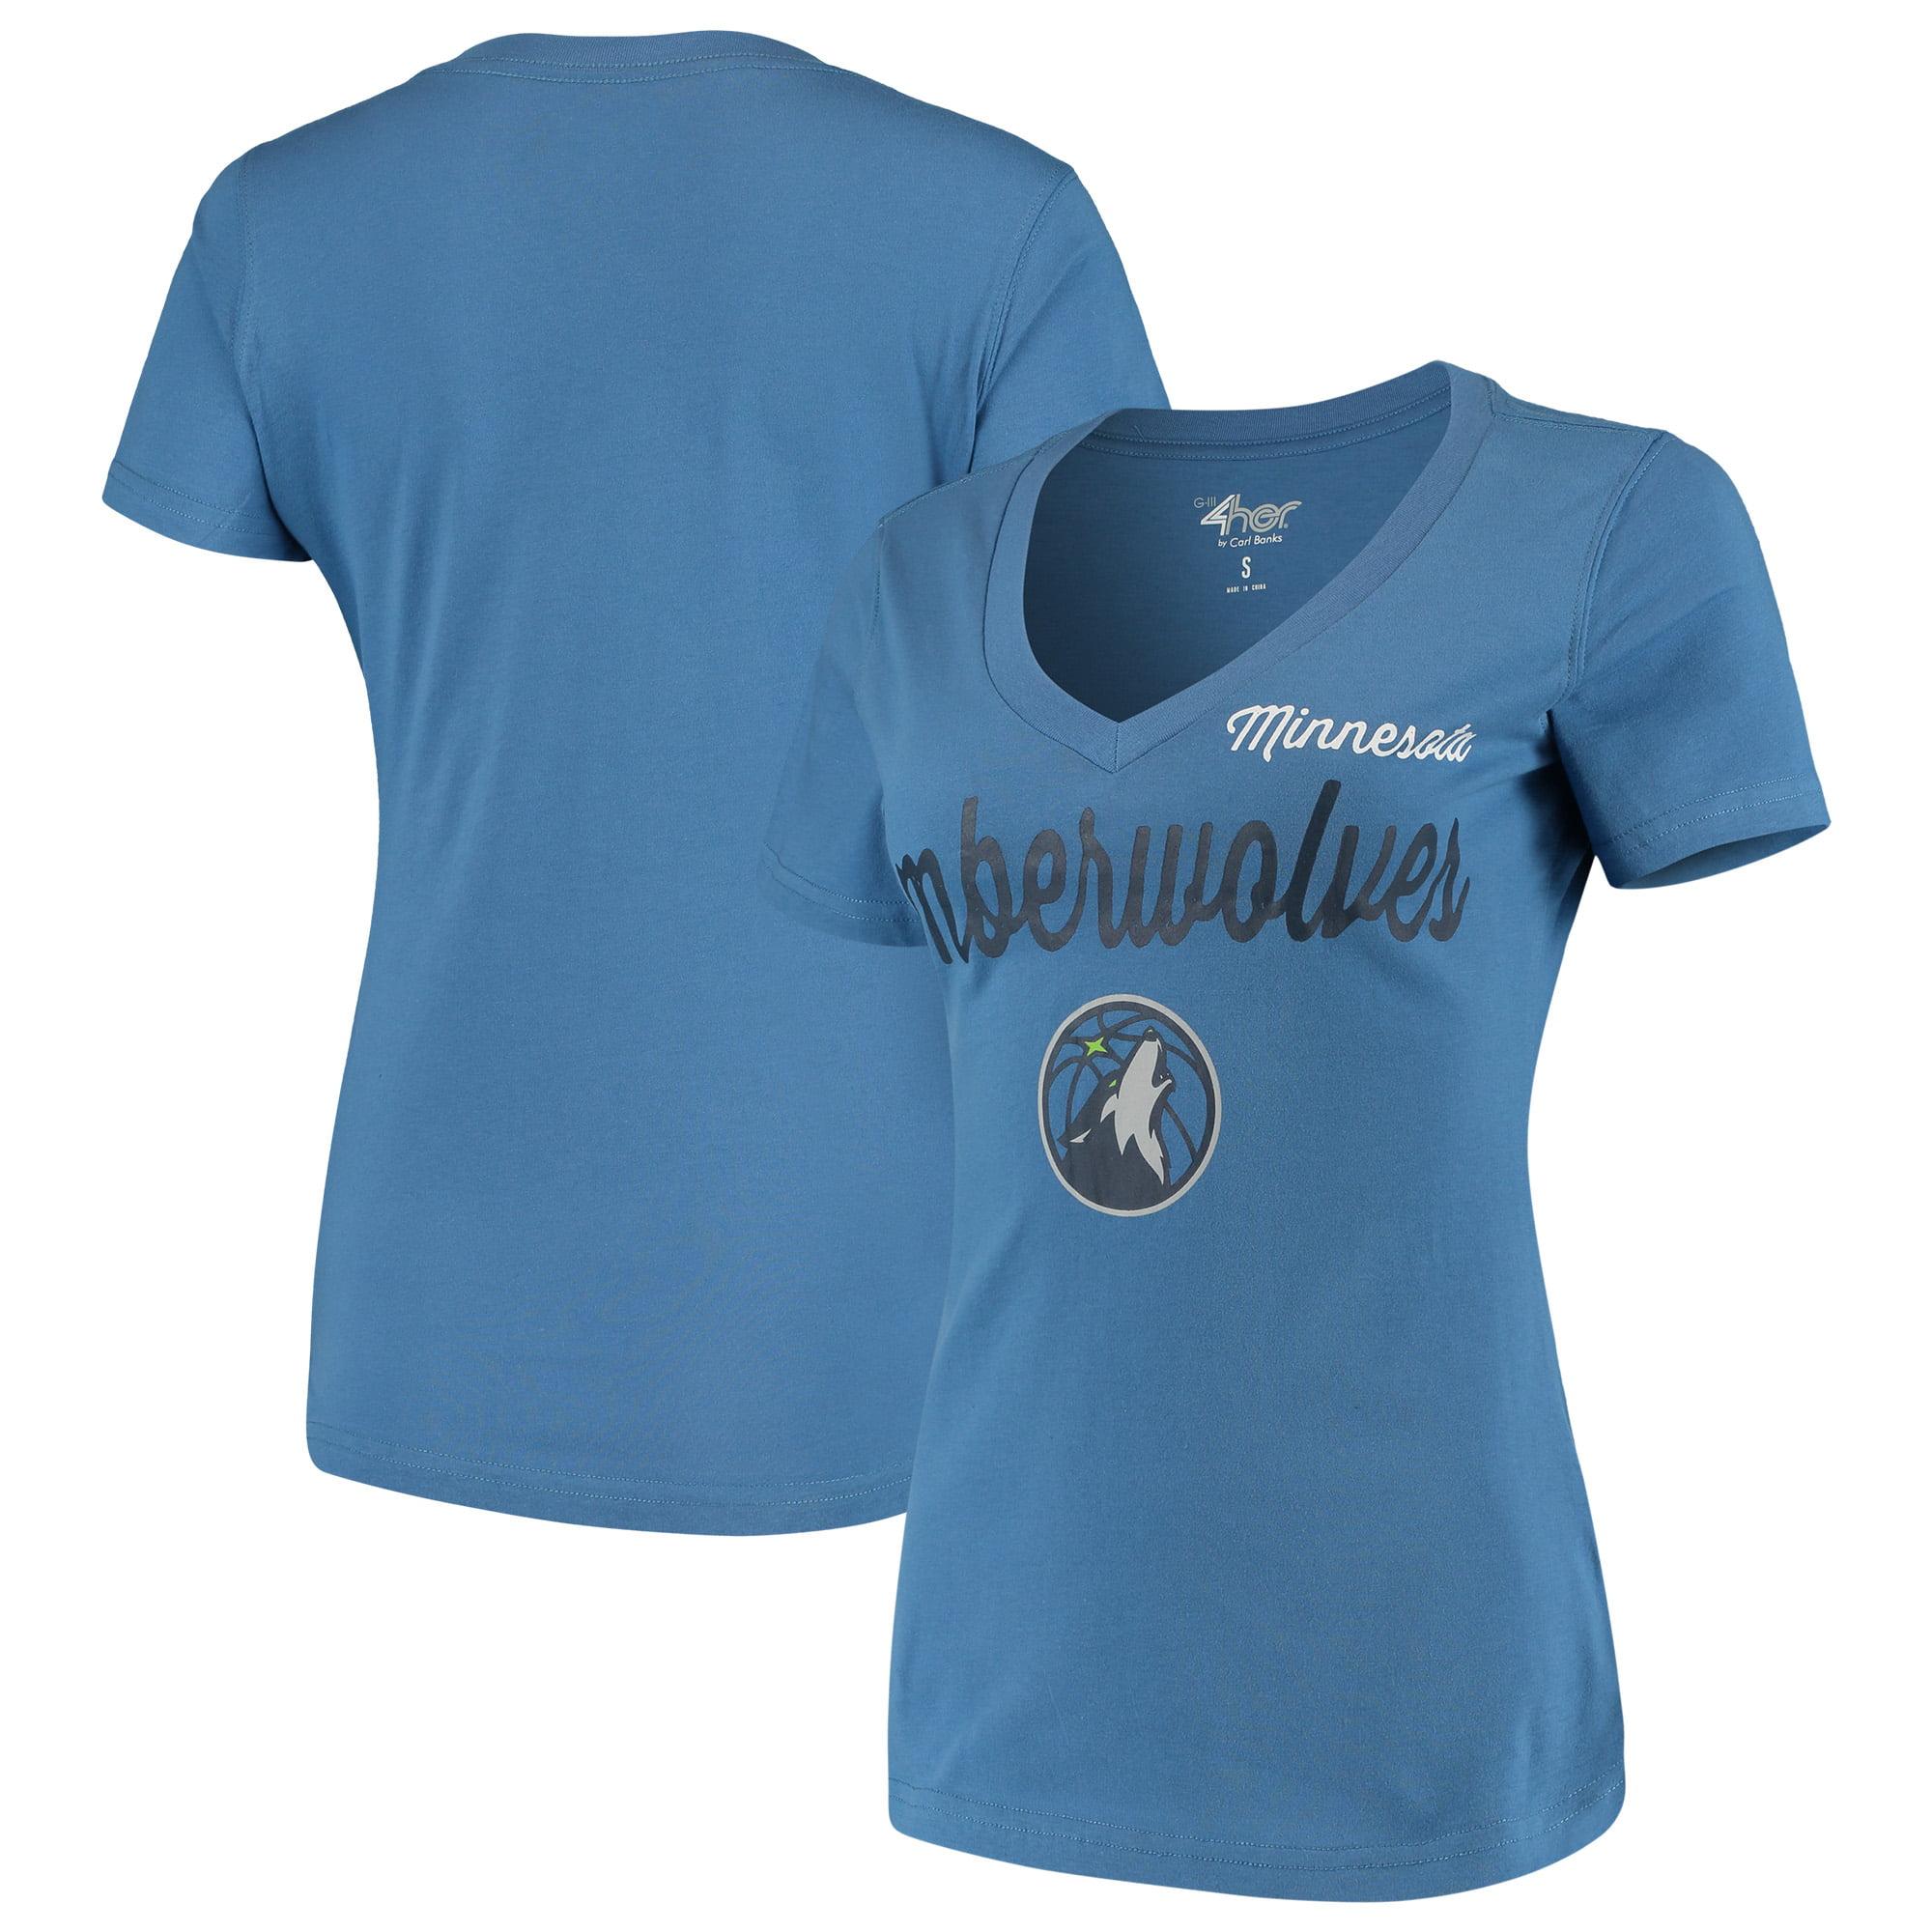 Minnesota Timberwolves G-III 4Her by Carl Banks Women's Post Season V-Neck Short Sleeve T-Shirt - Blue